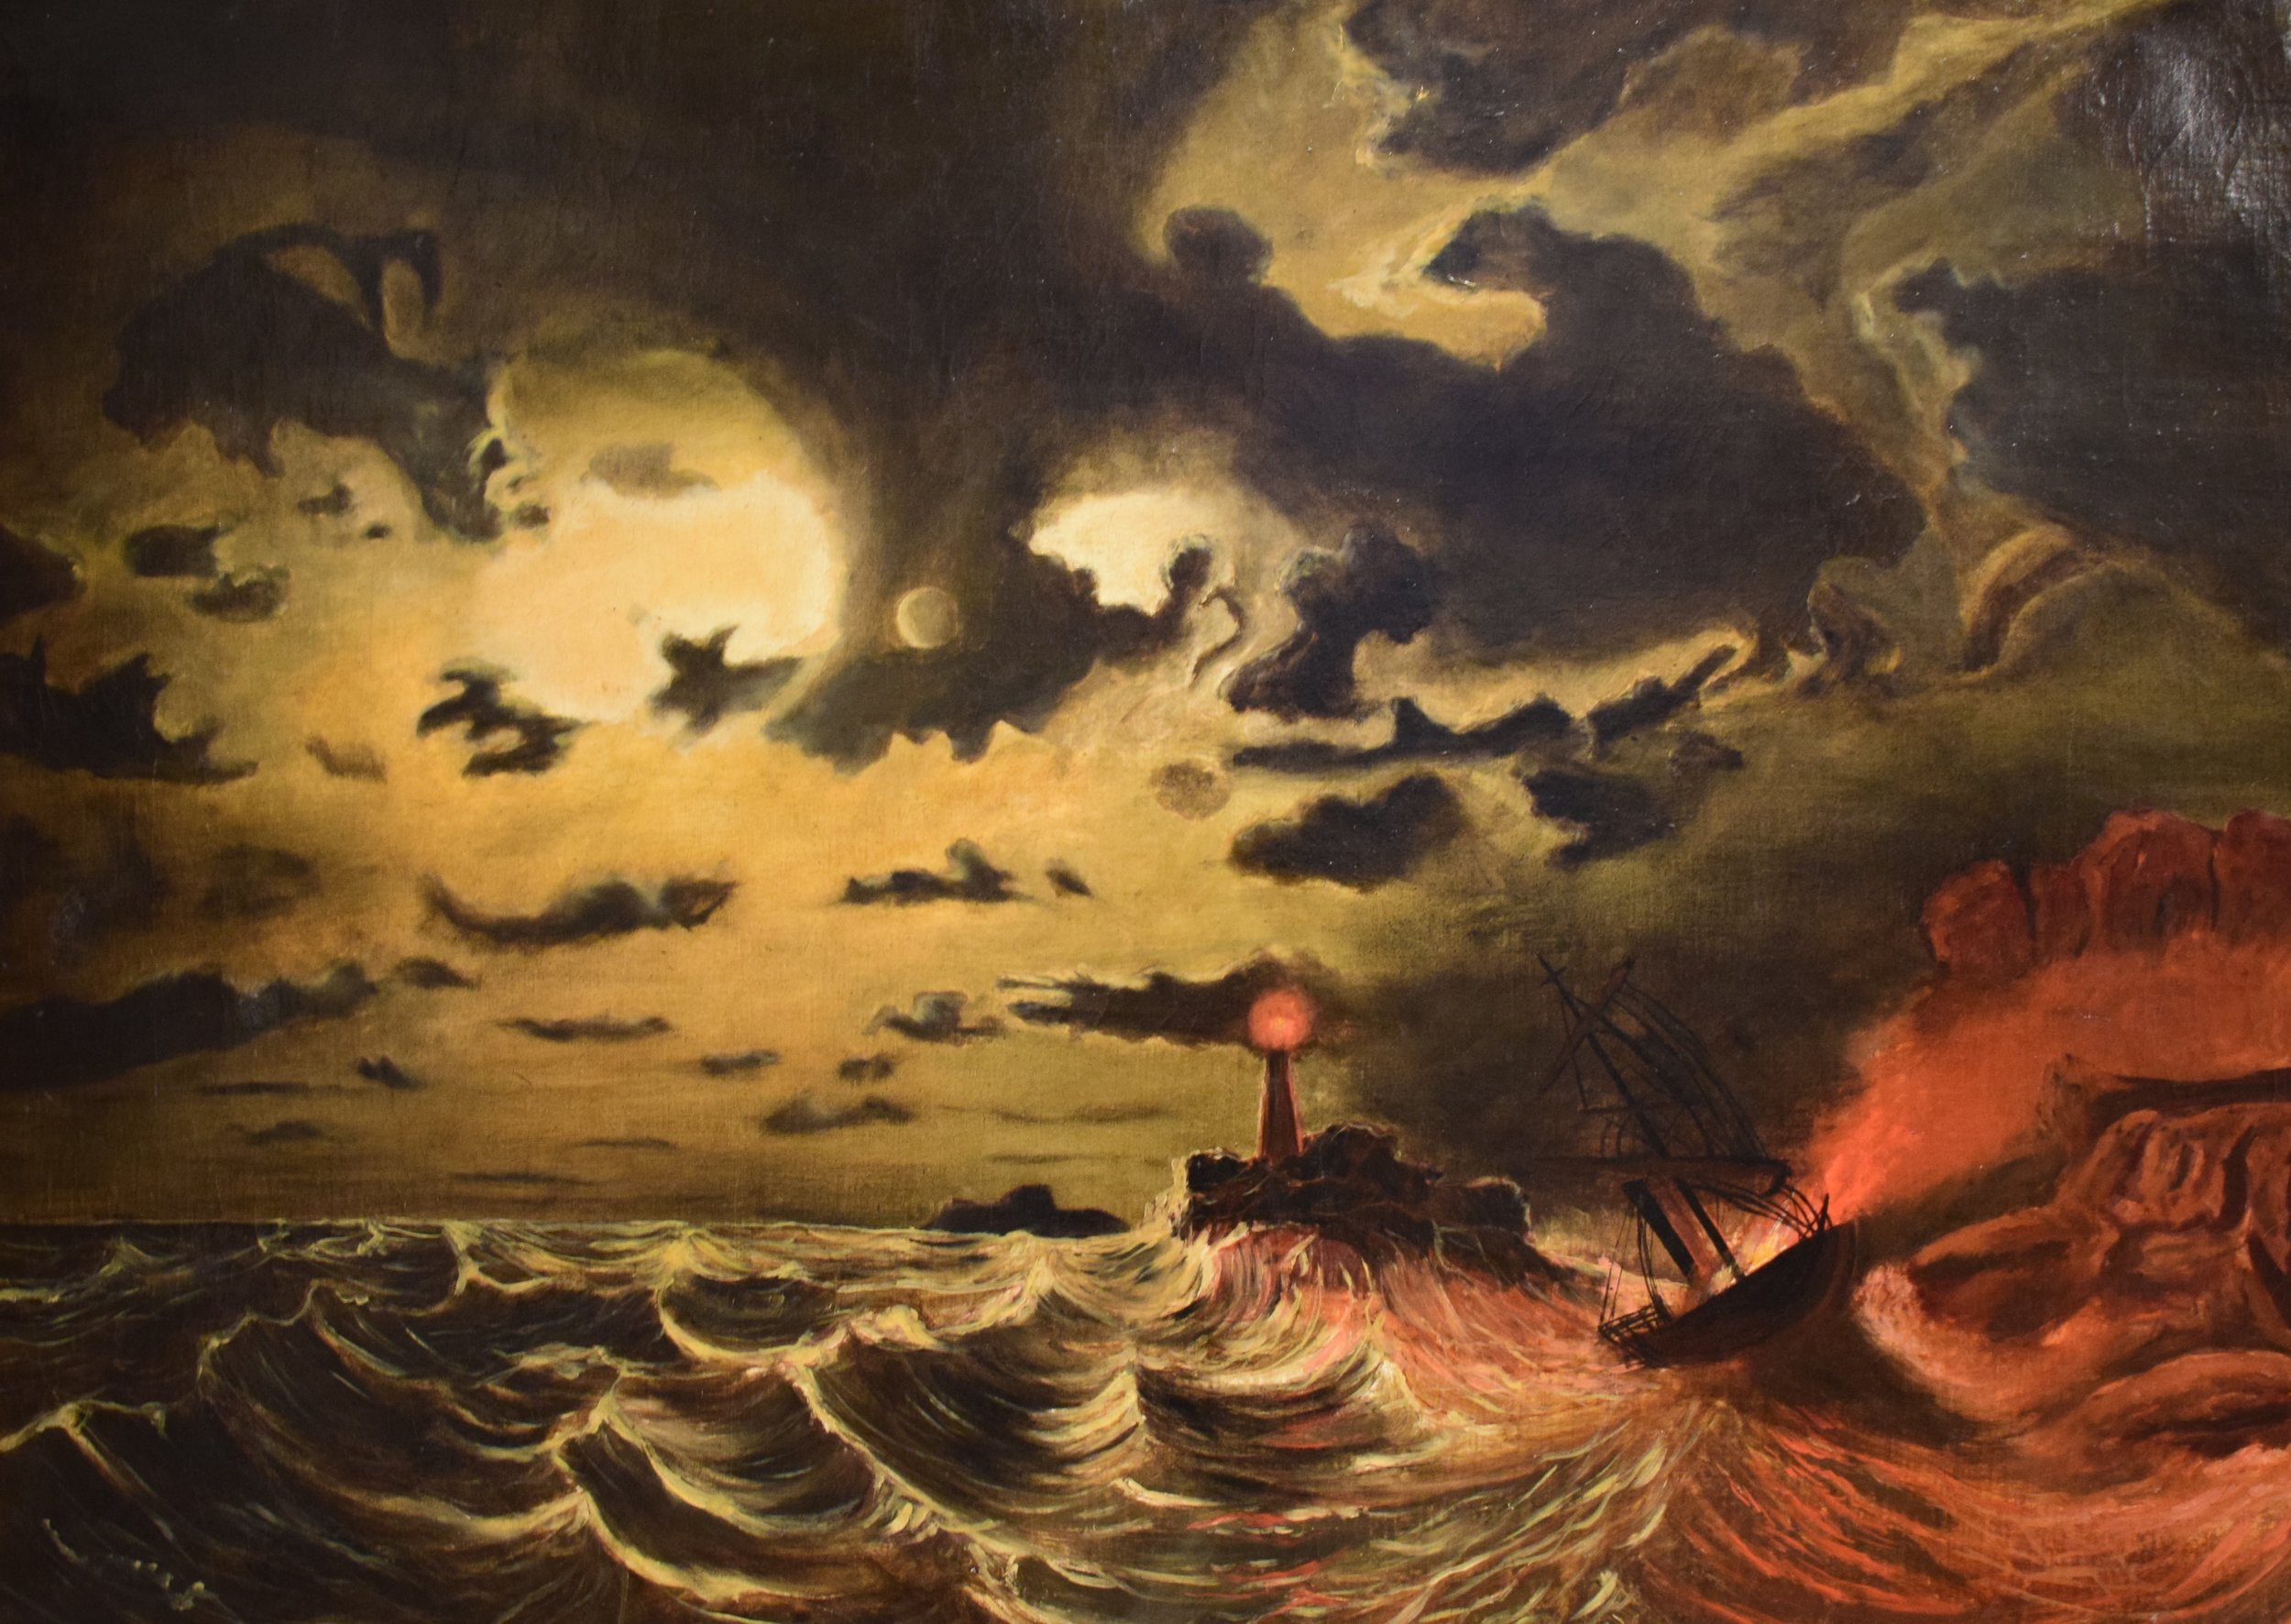 Marcus Larson, Steamer in Flames, 1850s, Göteborgs konstmuseum